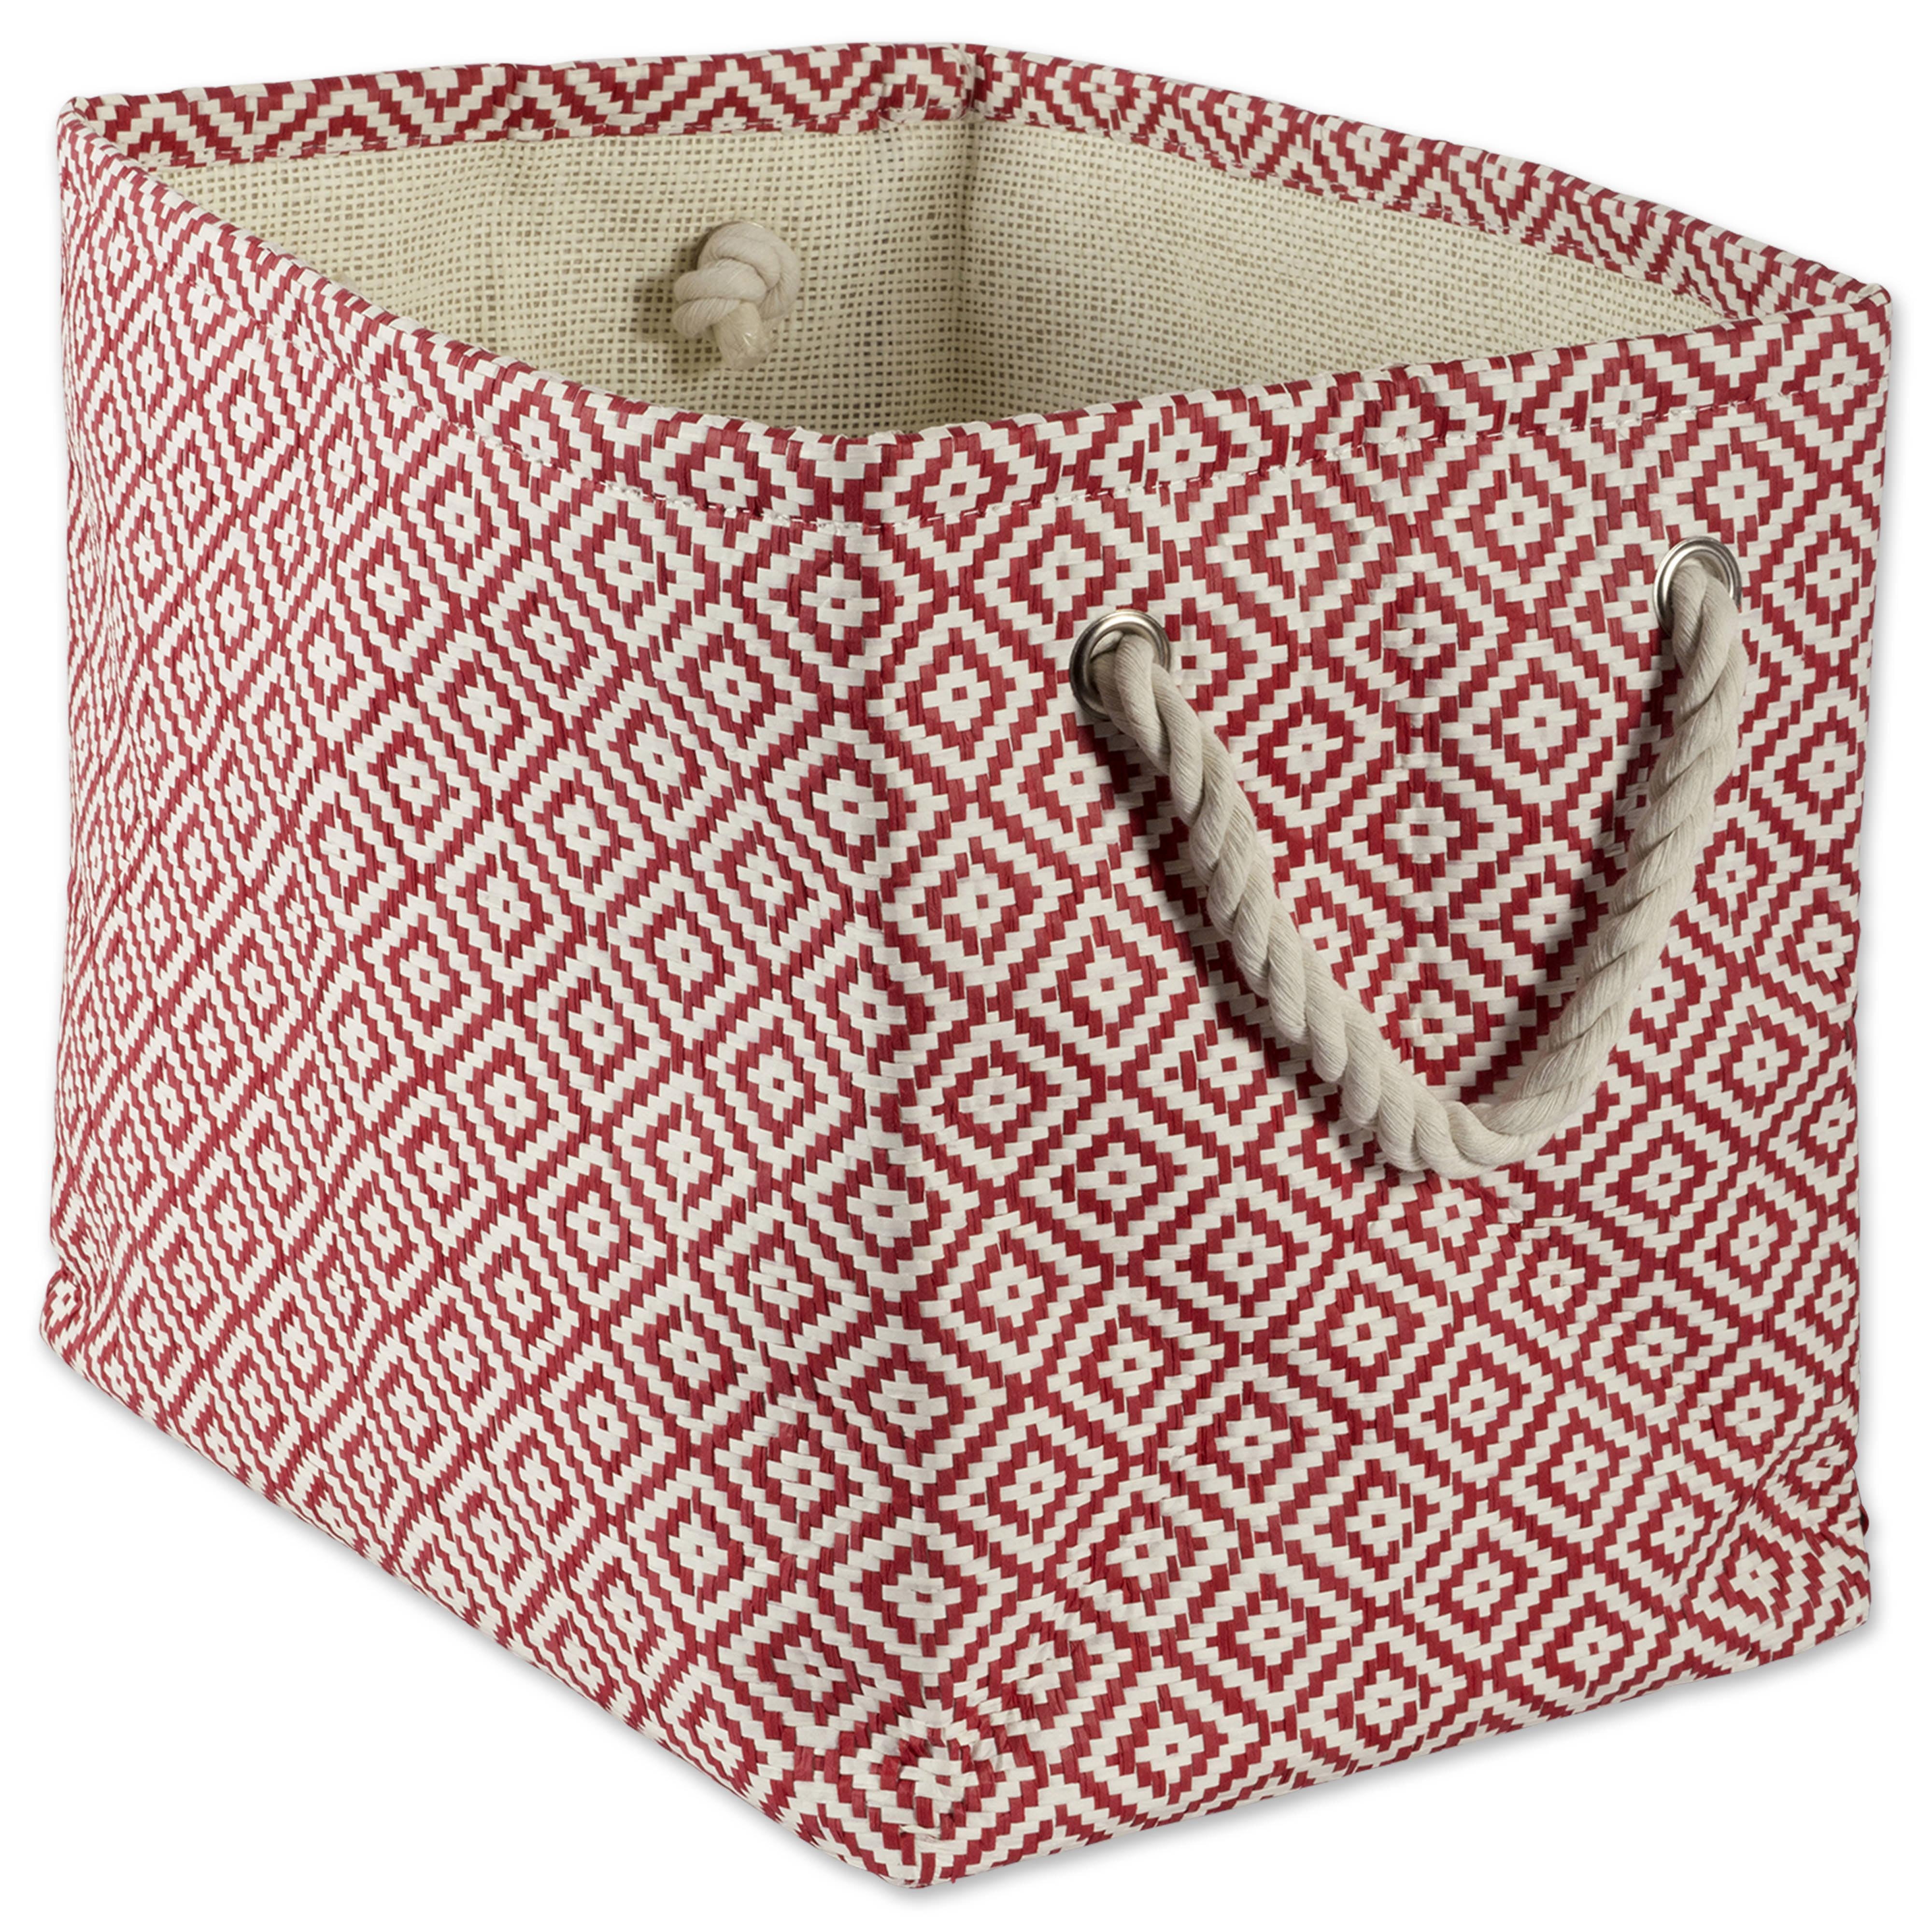 "Design Imports Paper Bin Geo Diamond Rust Rectangle Small, 11""x10""x9"", 100% Natural Woven Paper, Red"